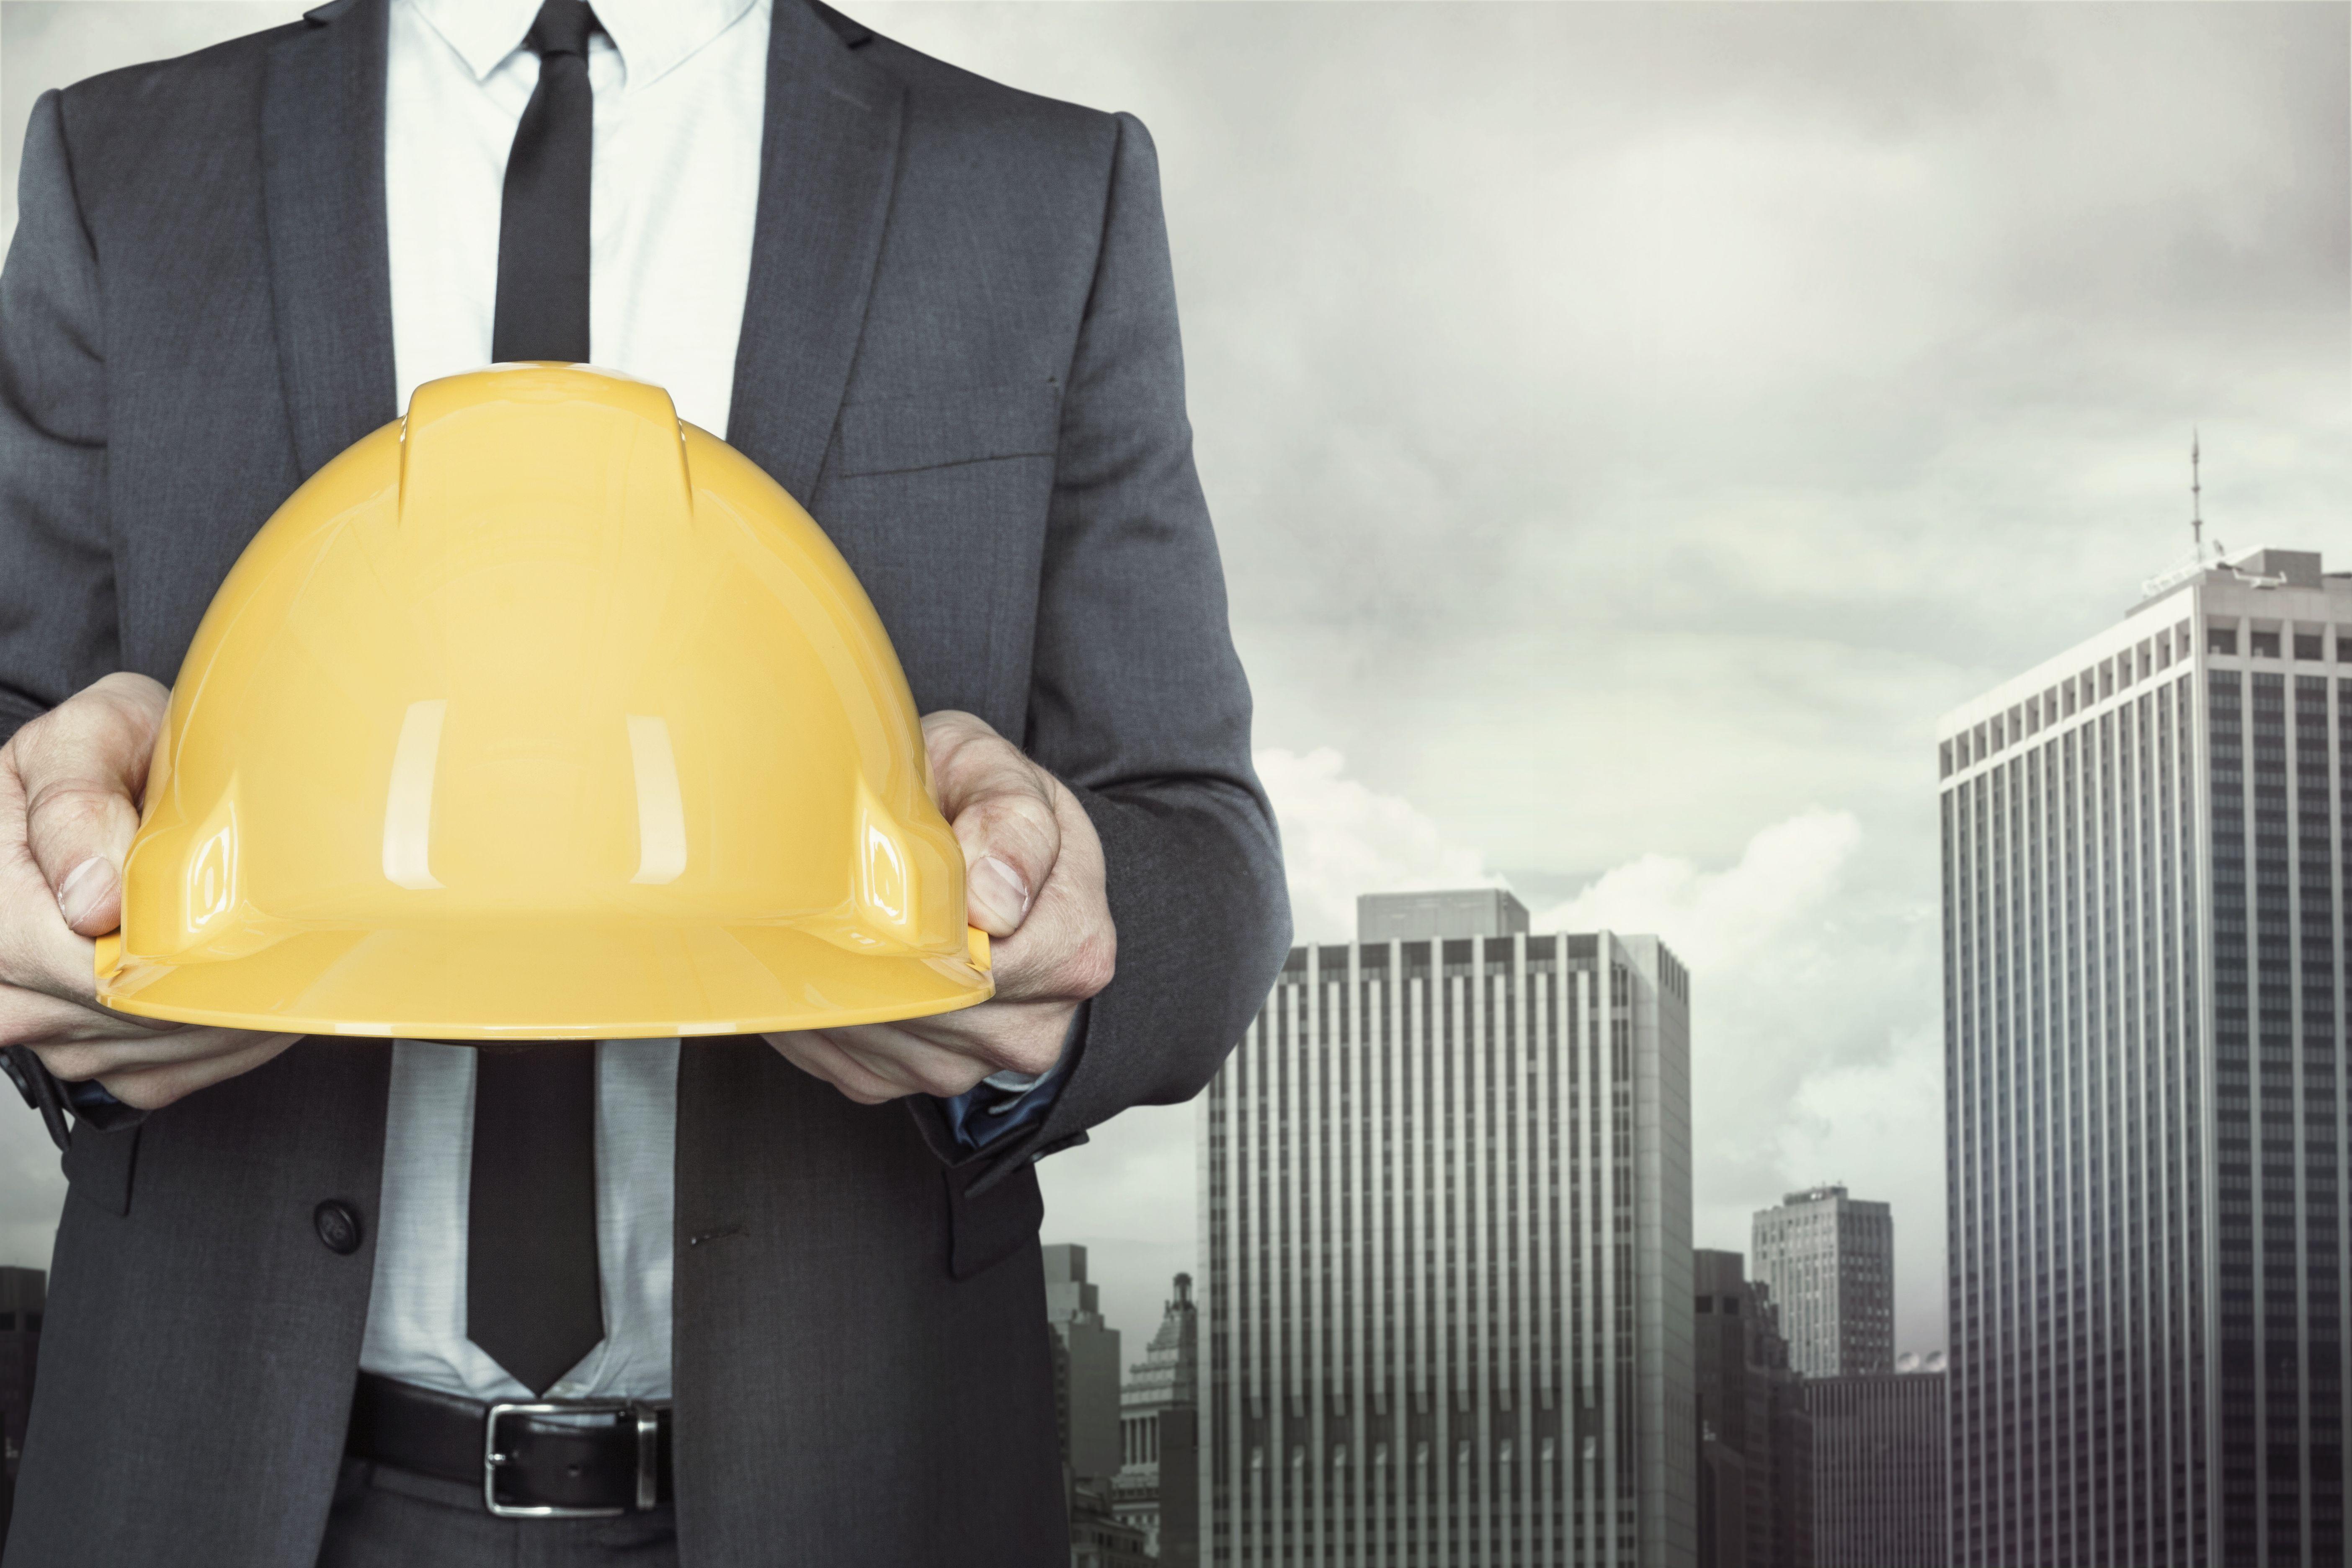 Peritación de riesgos diversos I+R+D: Servicios de Bureau Técnico Pericial